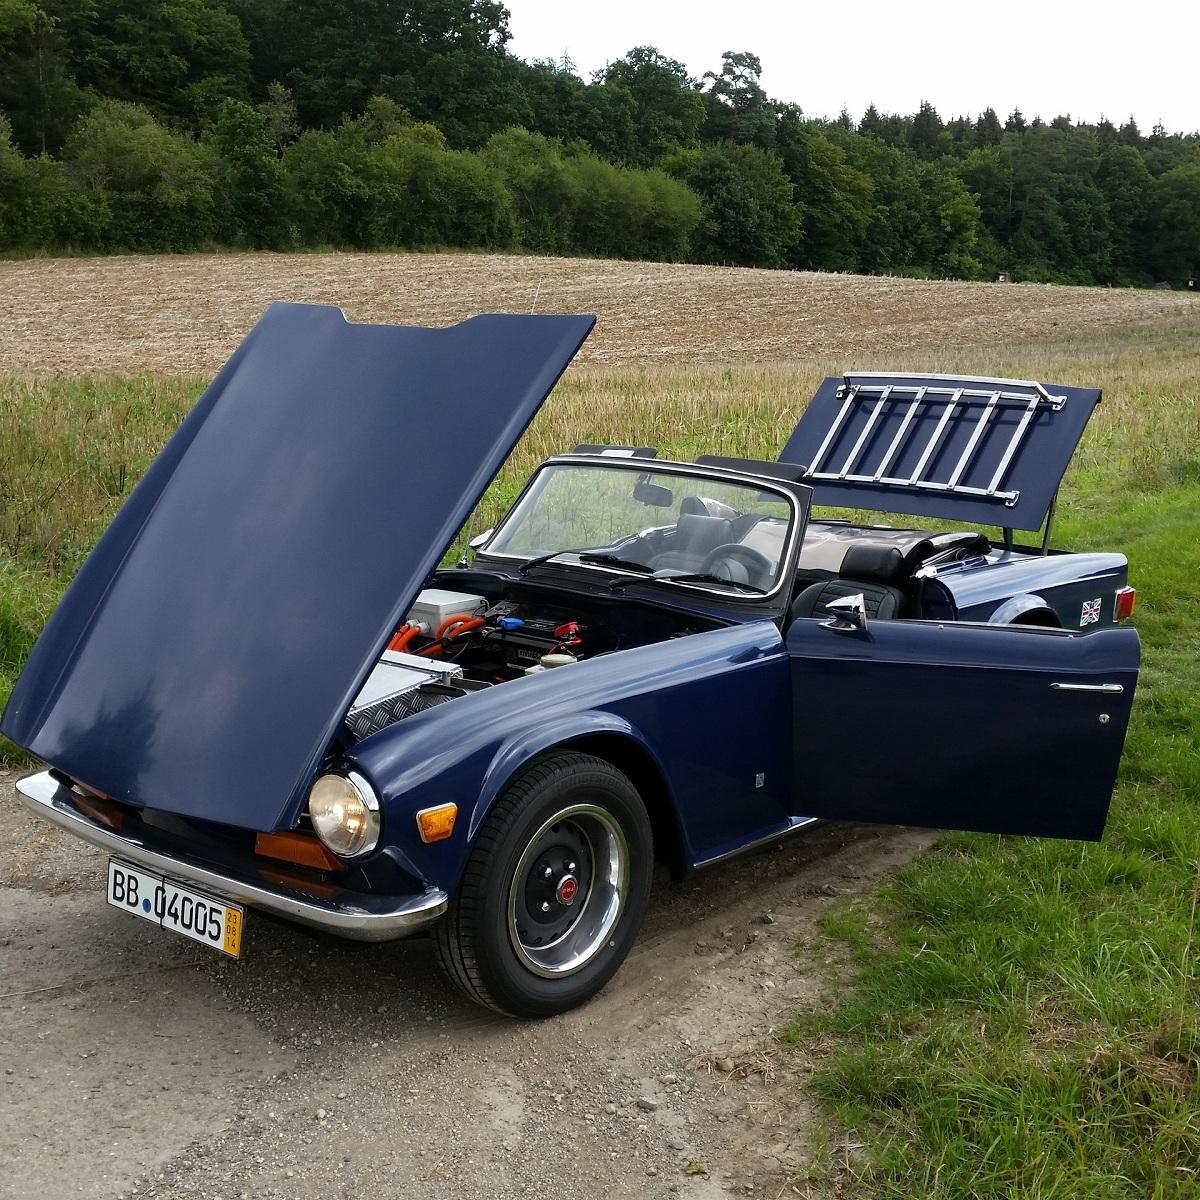 Elektroauto Umbau Triumpf TR 6 - Murschel Electric Cars - Oldtimer Restauration - Interieur Design - Batterie Fertigung - Elektroauto Prototypen Bau